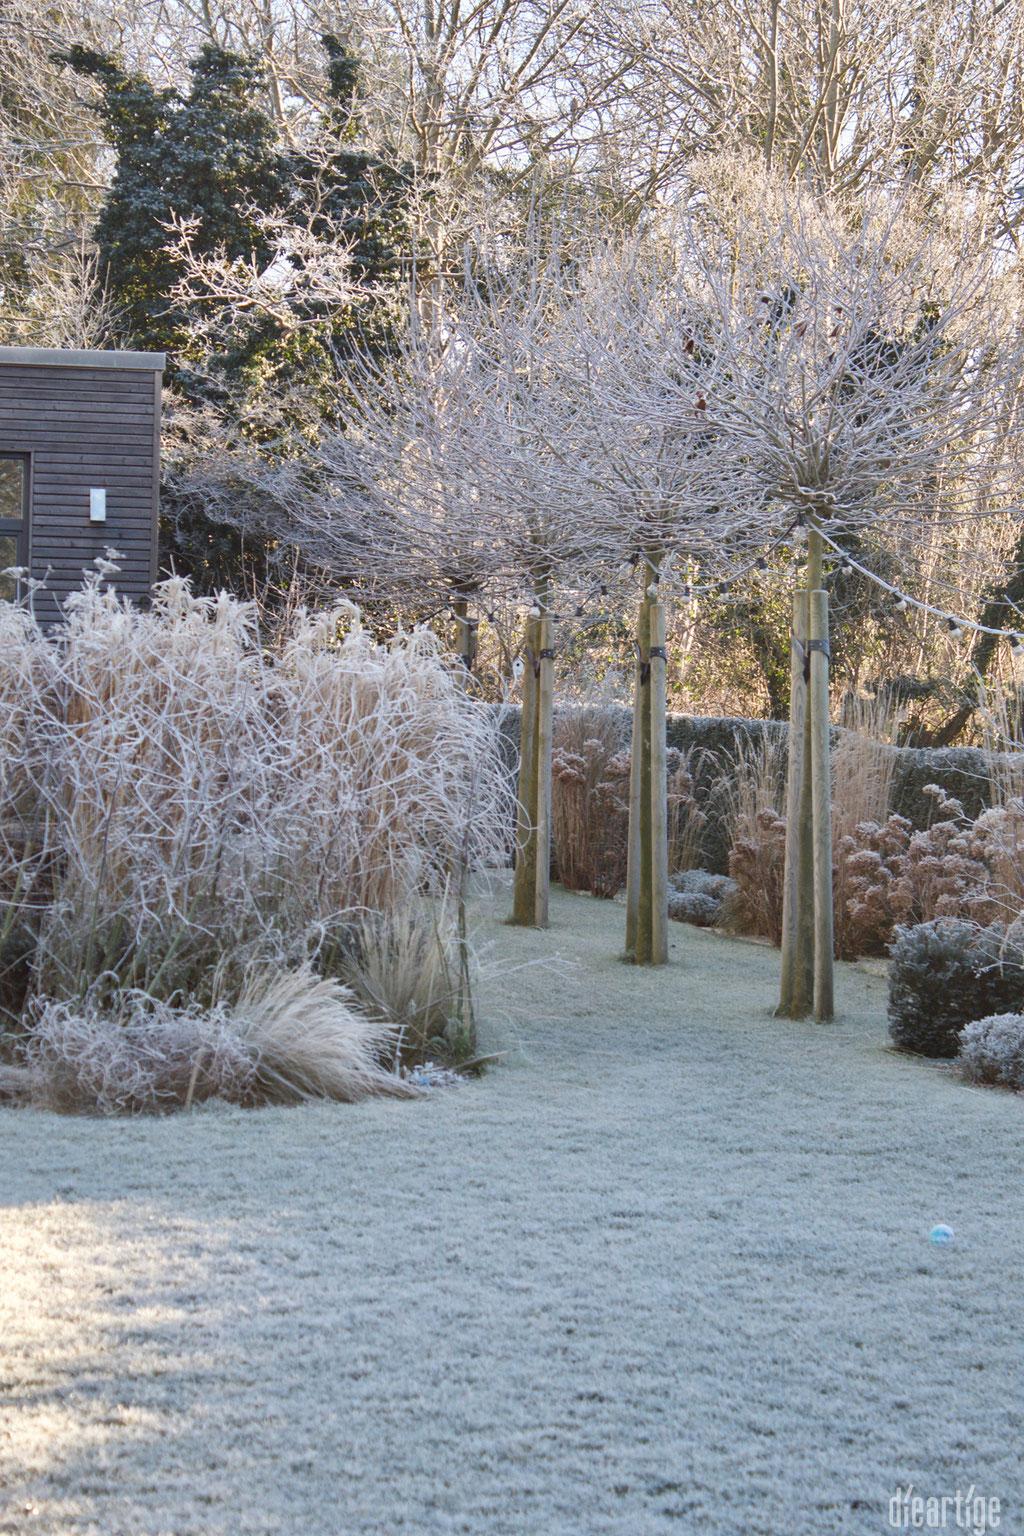 dieartigeBLOG - Wintergarten, Rauhreif + Eiskristalle, Chinaschilf, Platanen + Hortensien